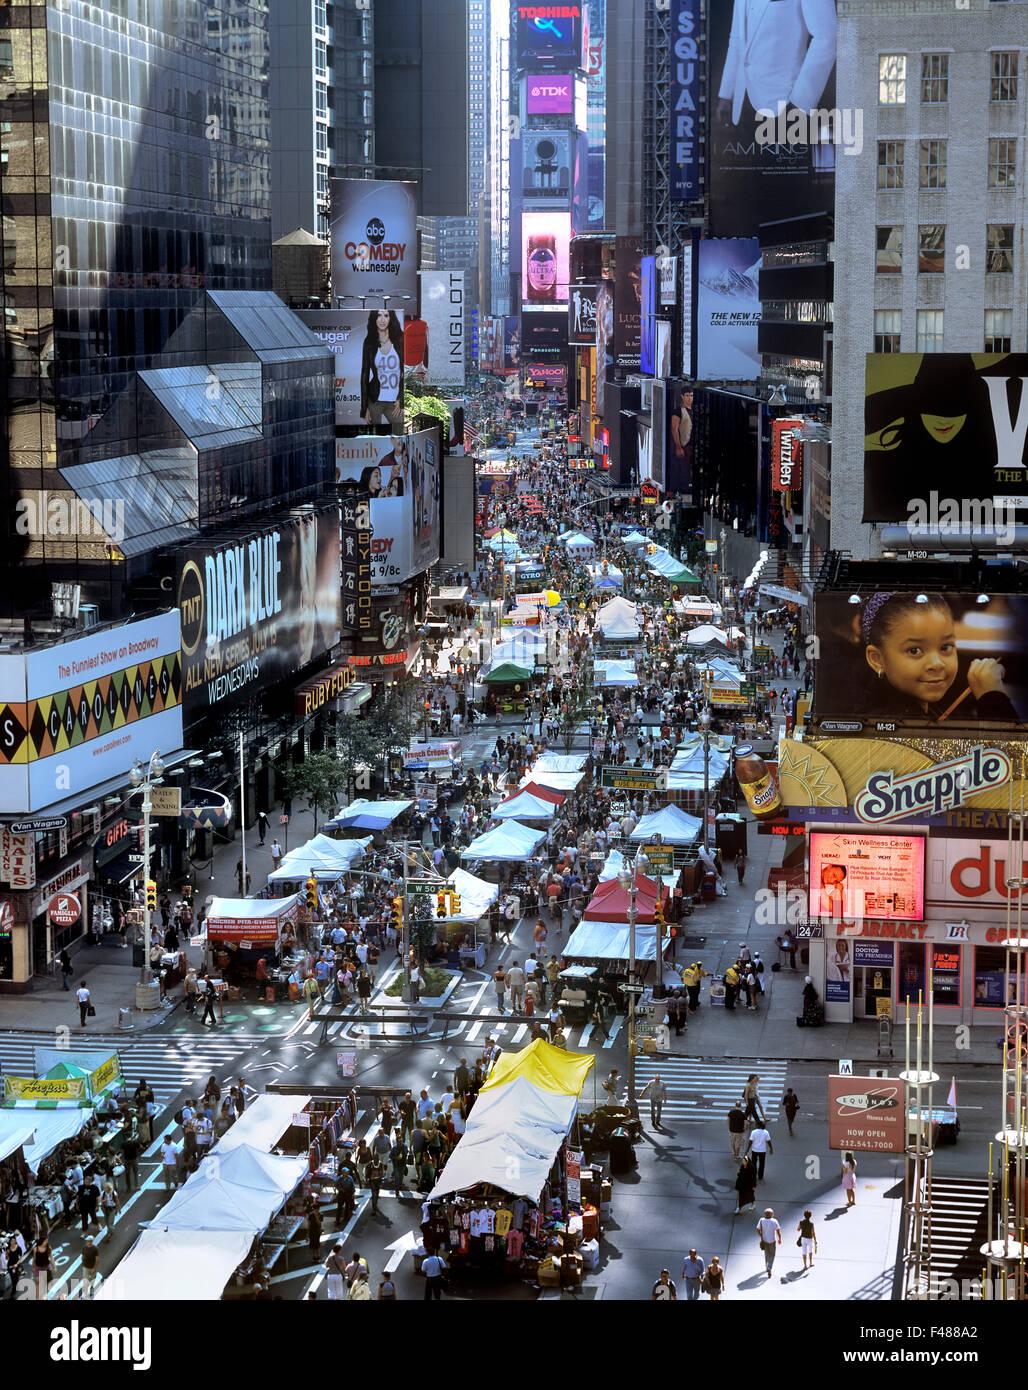 A Sunday morning street market on Broadway, New York City  Times